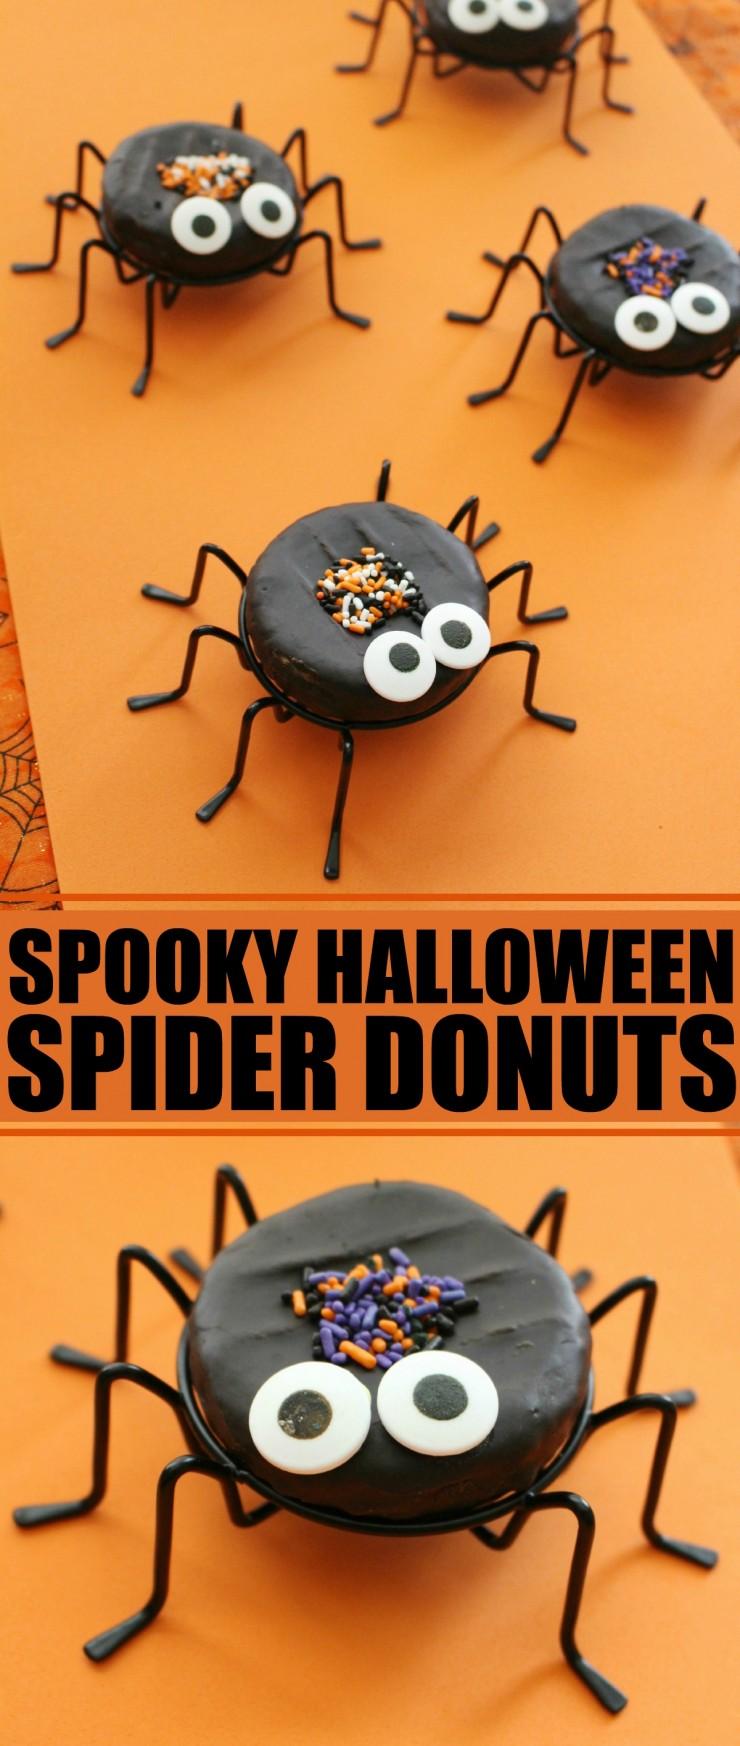 Spooky Halloween Spider Donuts